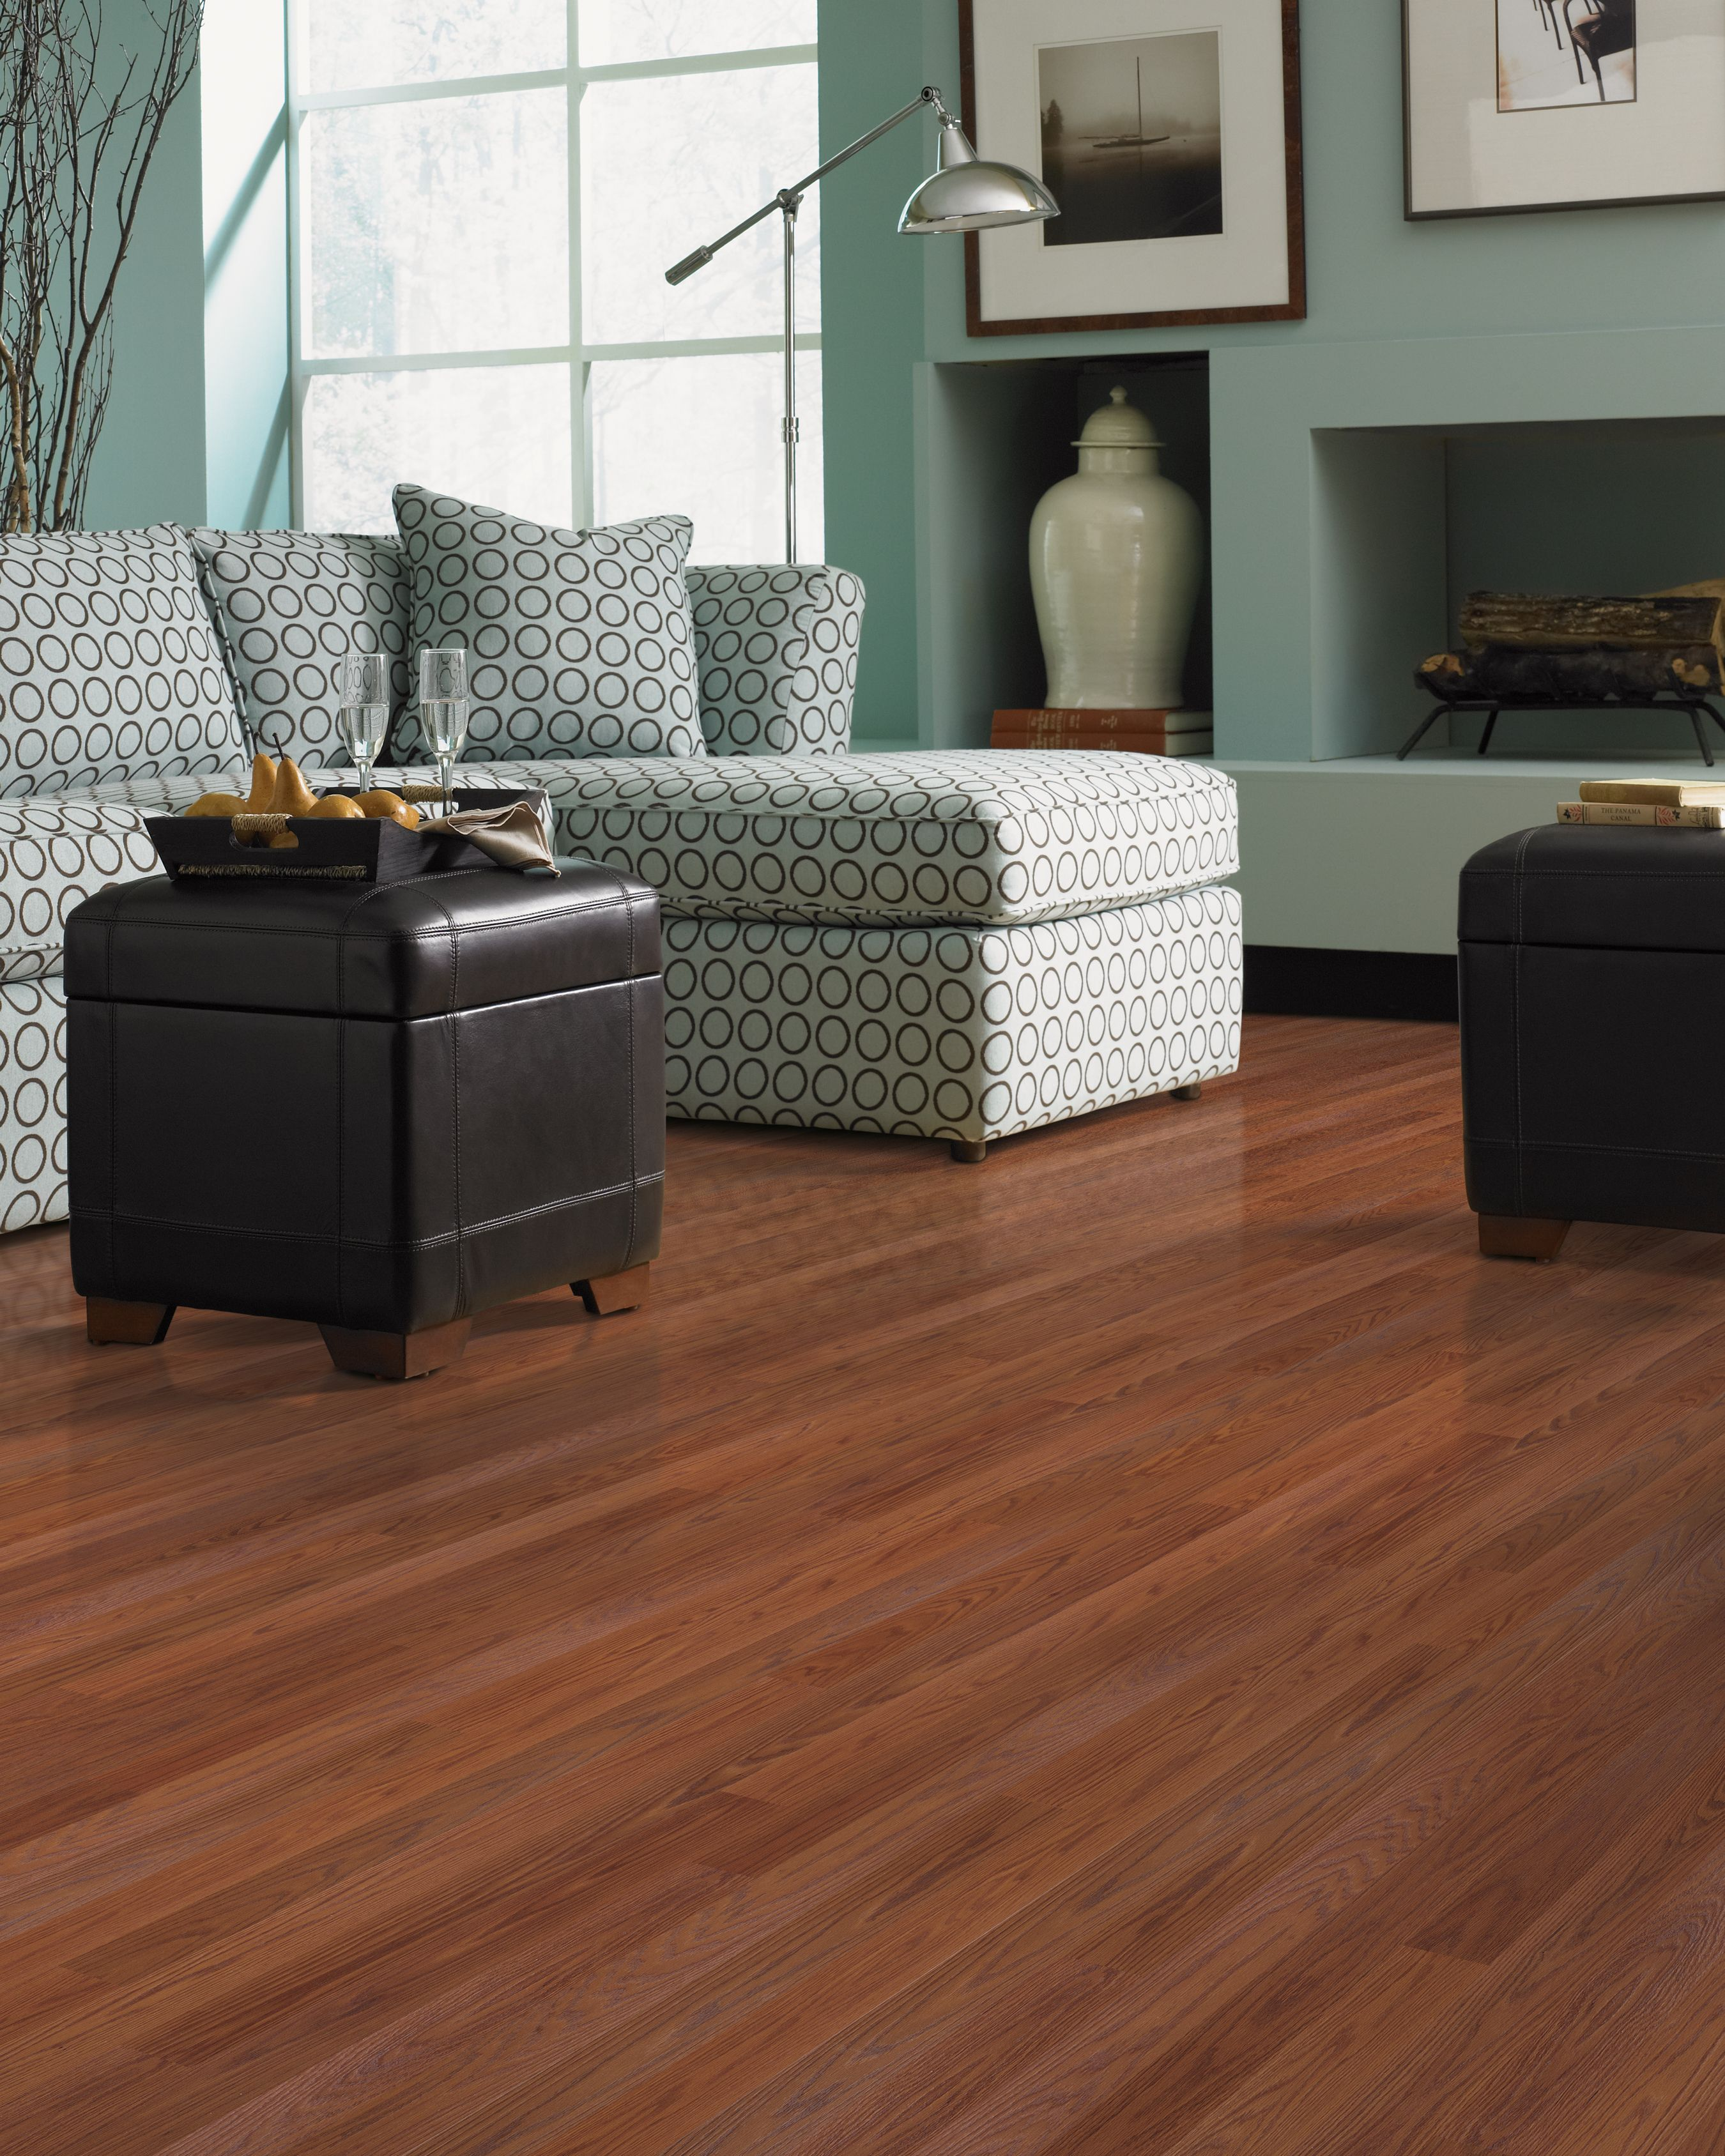 Pin by The Carpet Guys on Laminate Flooring, Laminate